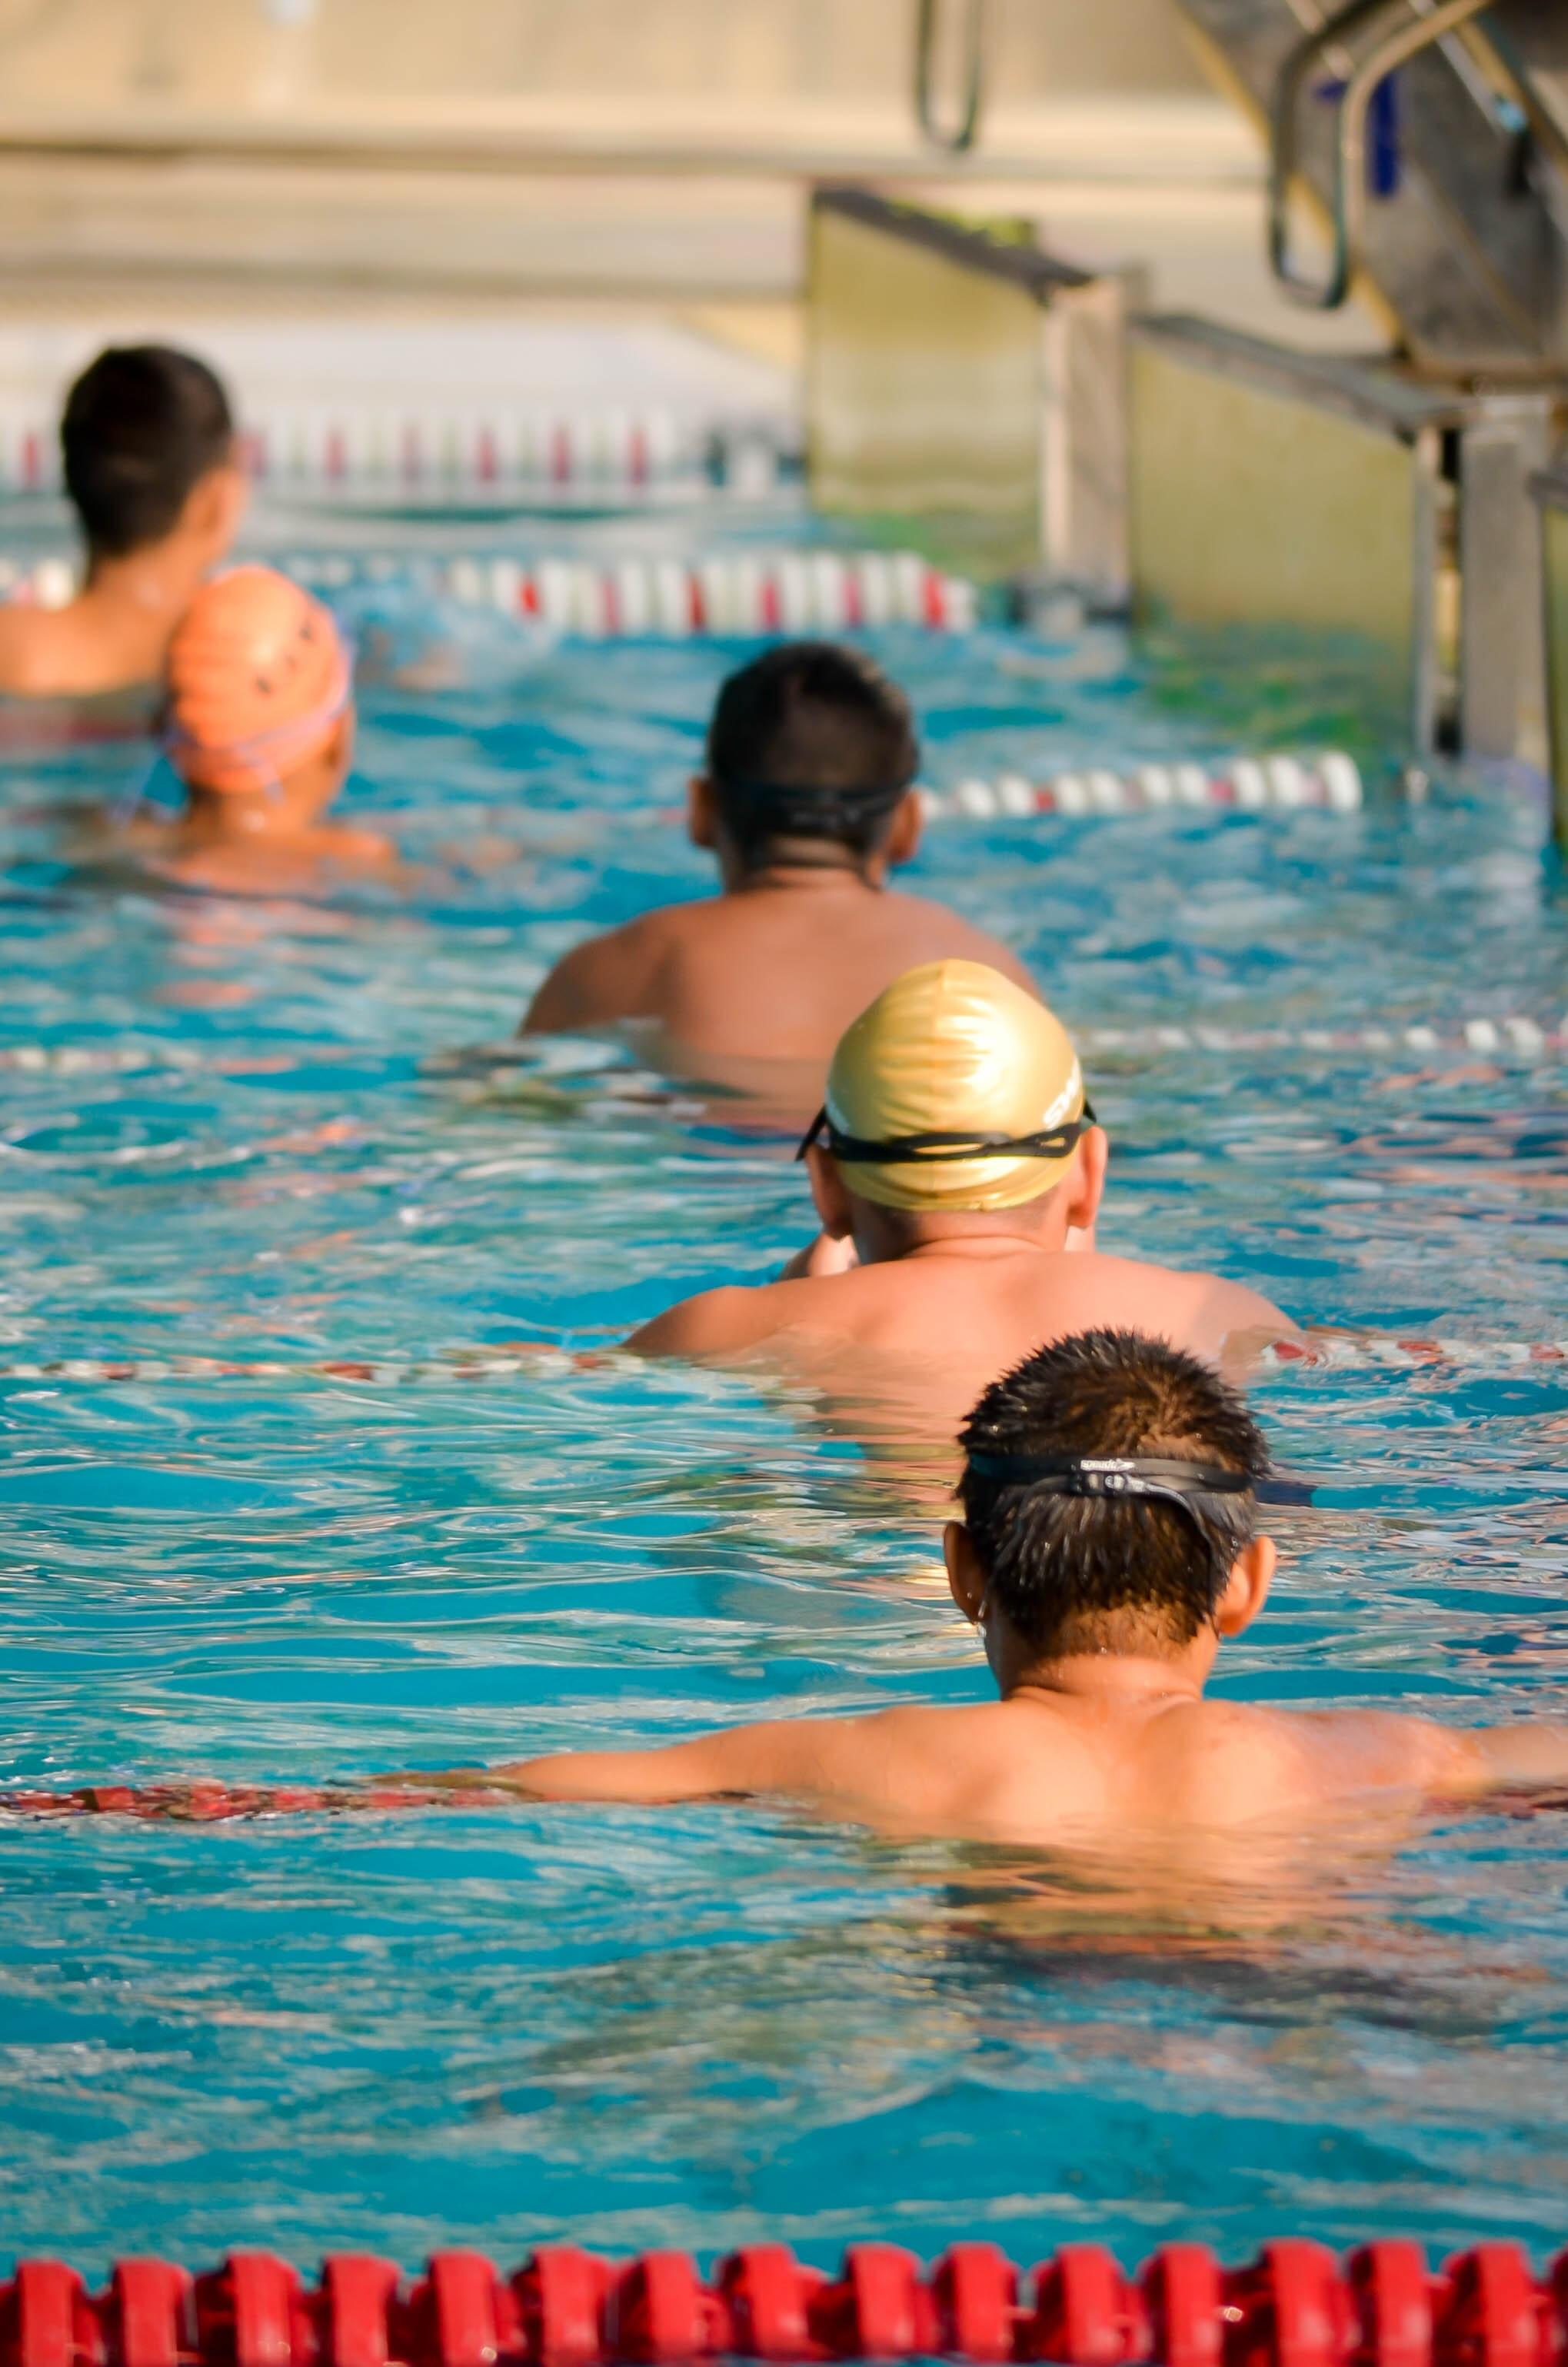 water-woman-sport-boy-kid-summer-816381-pxhere.com